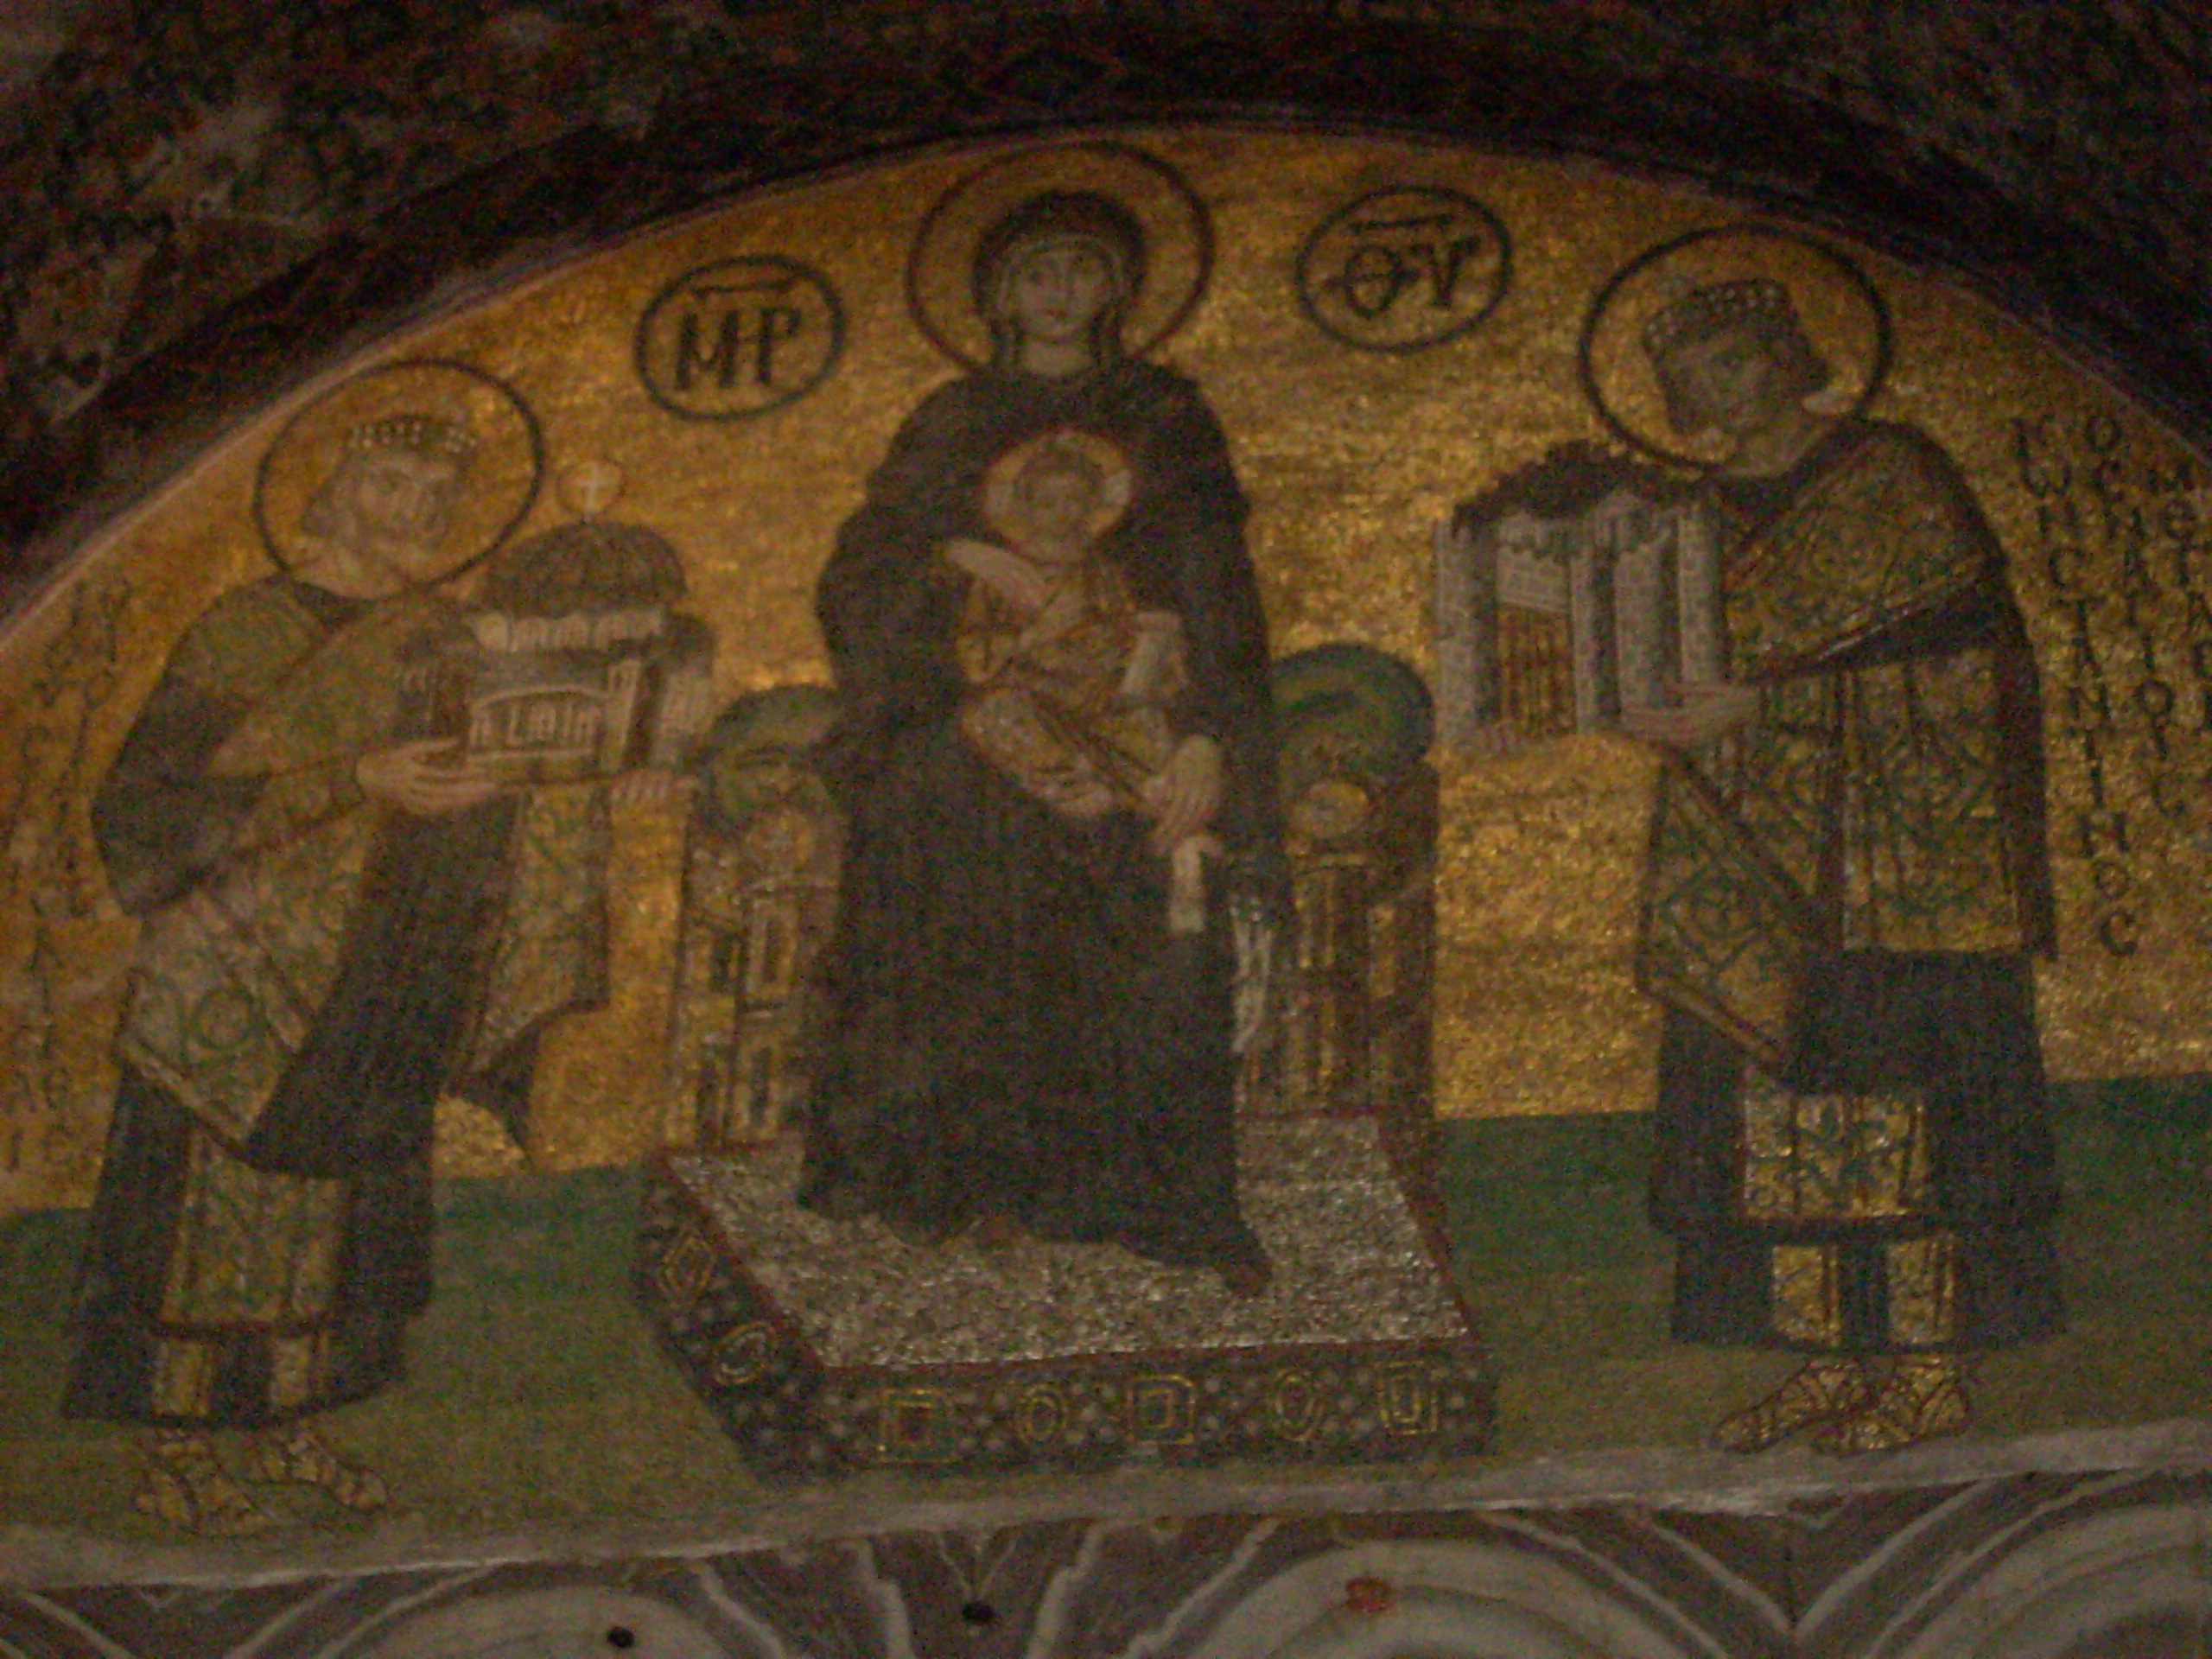 Hagia Sofia portal mosaic